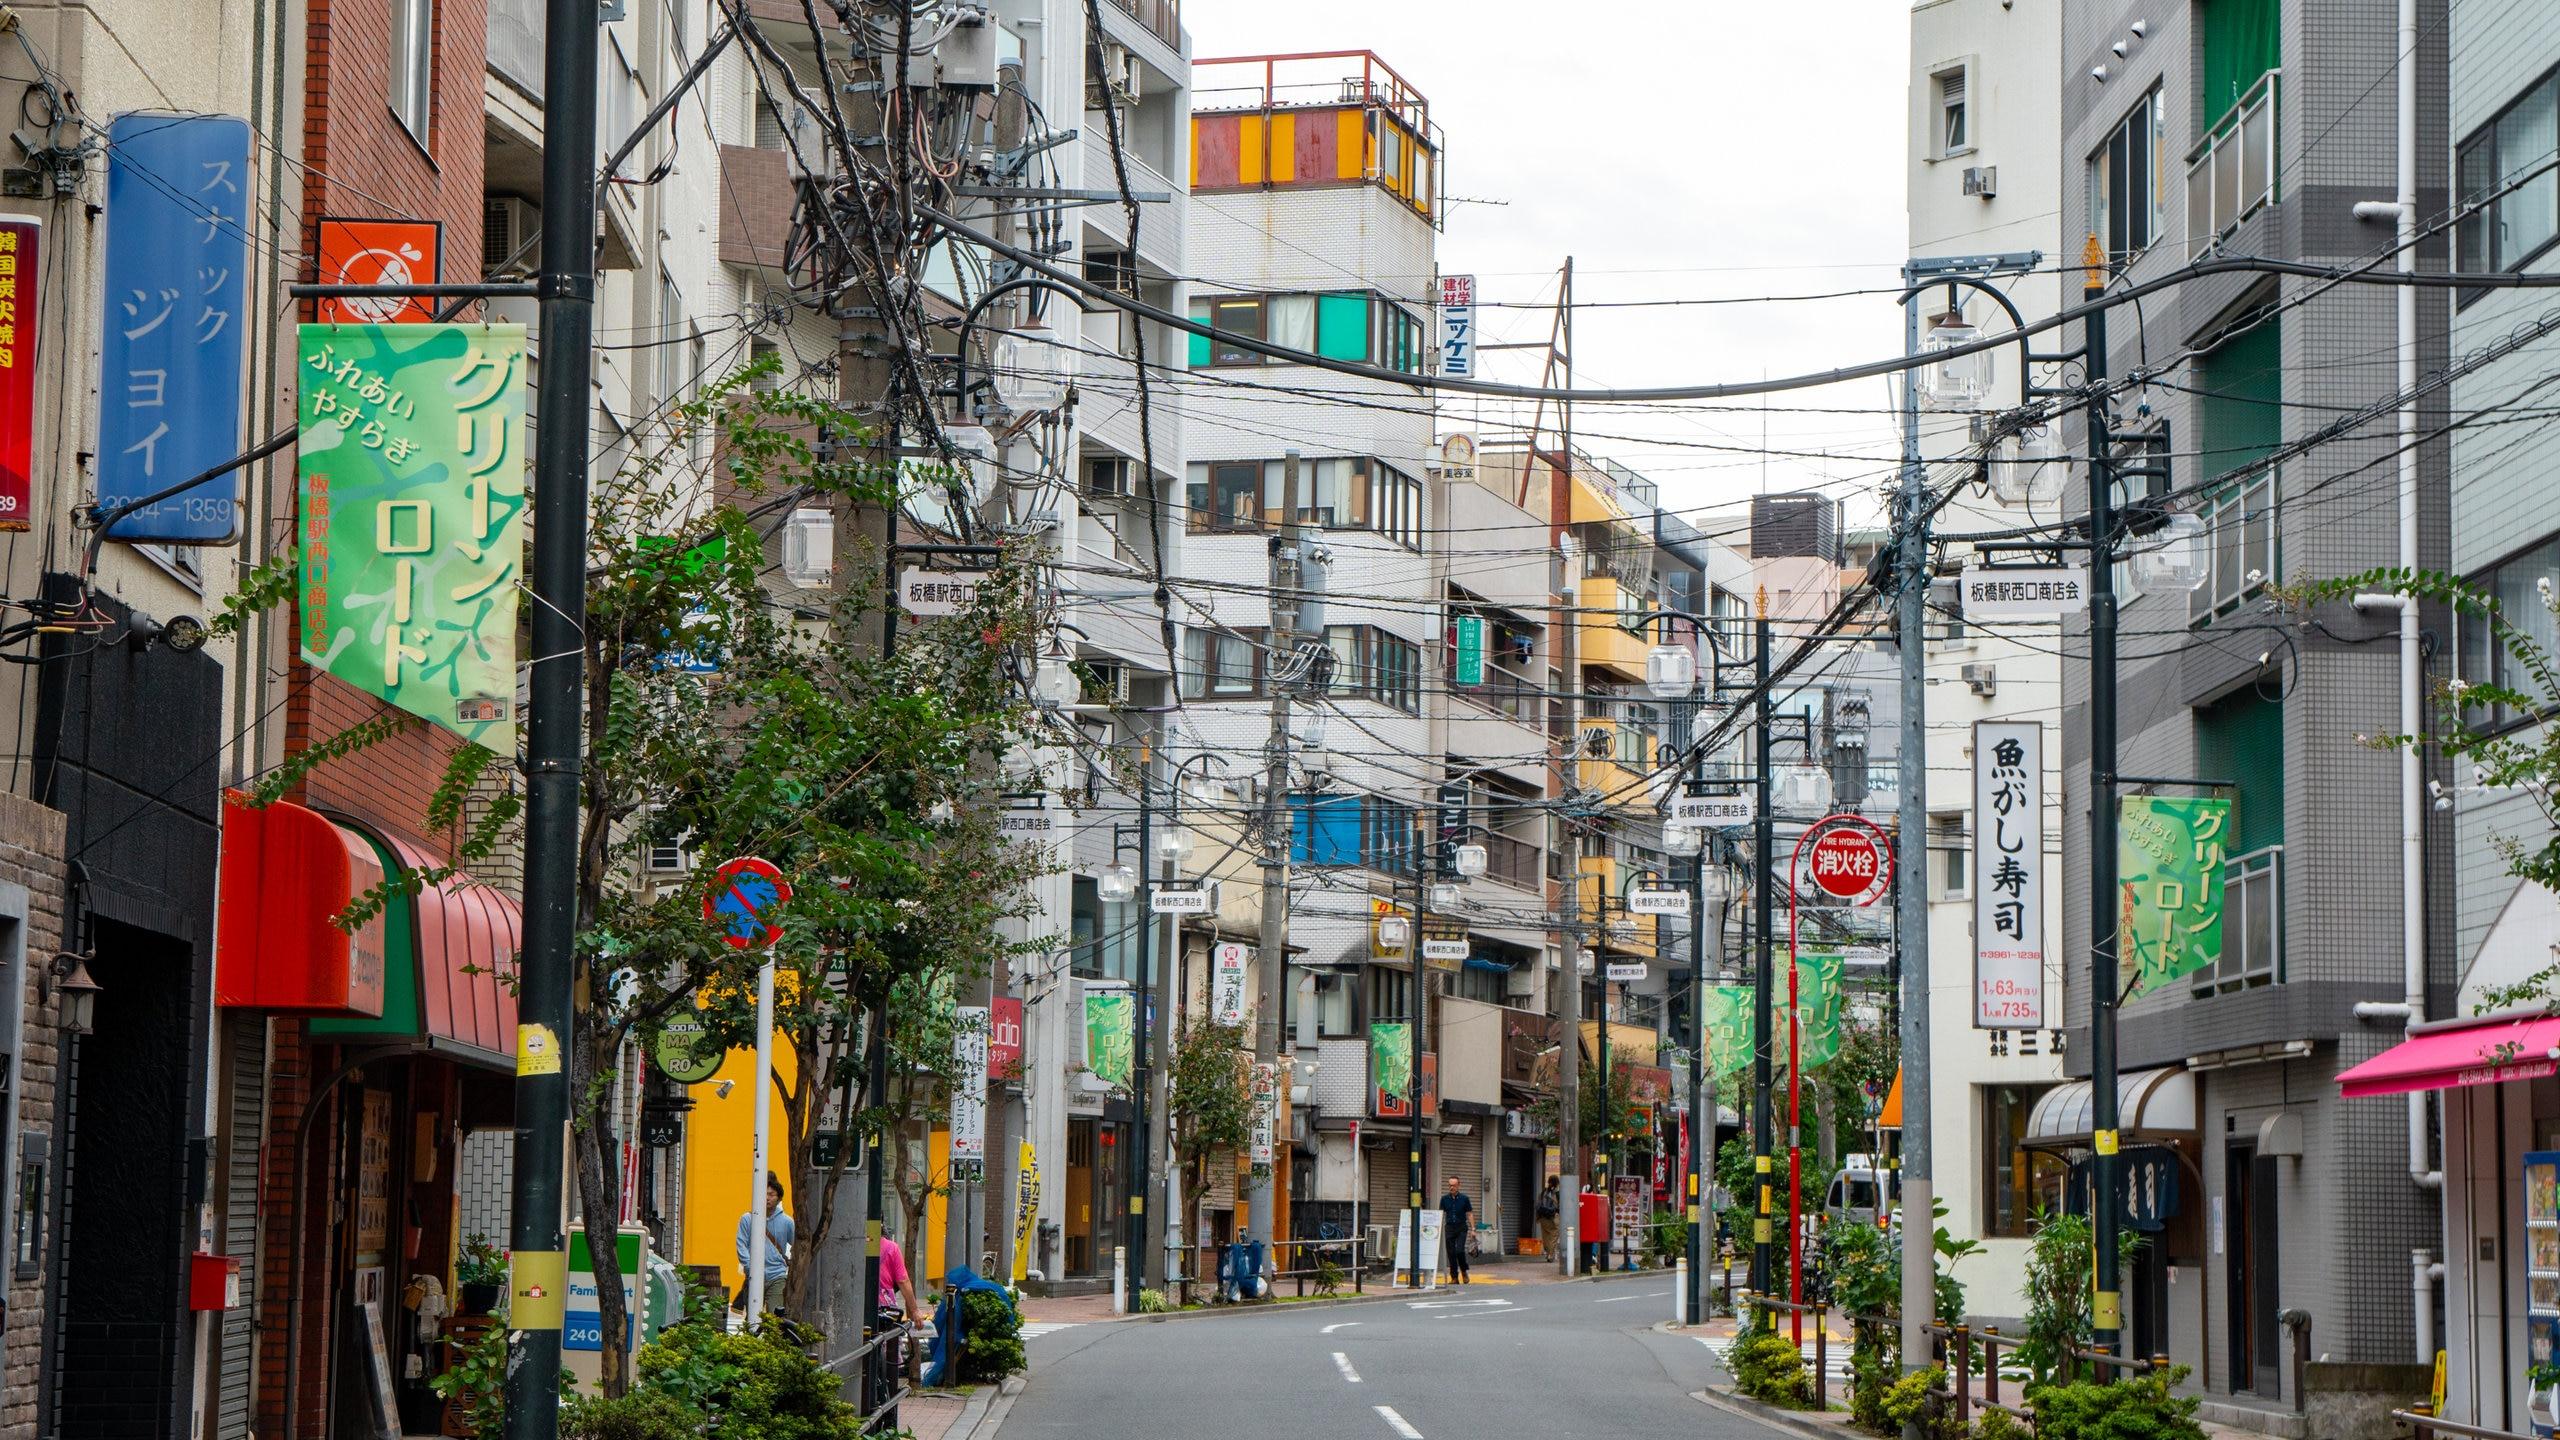 Itabashi, Tokio, Tokio (Präfektur), Japan